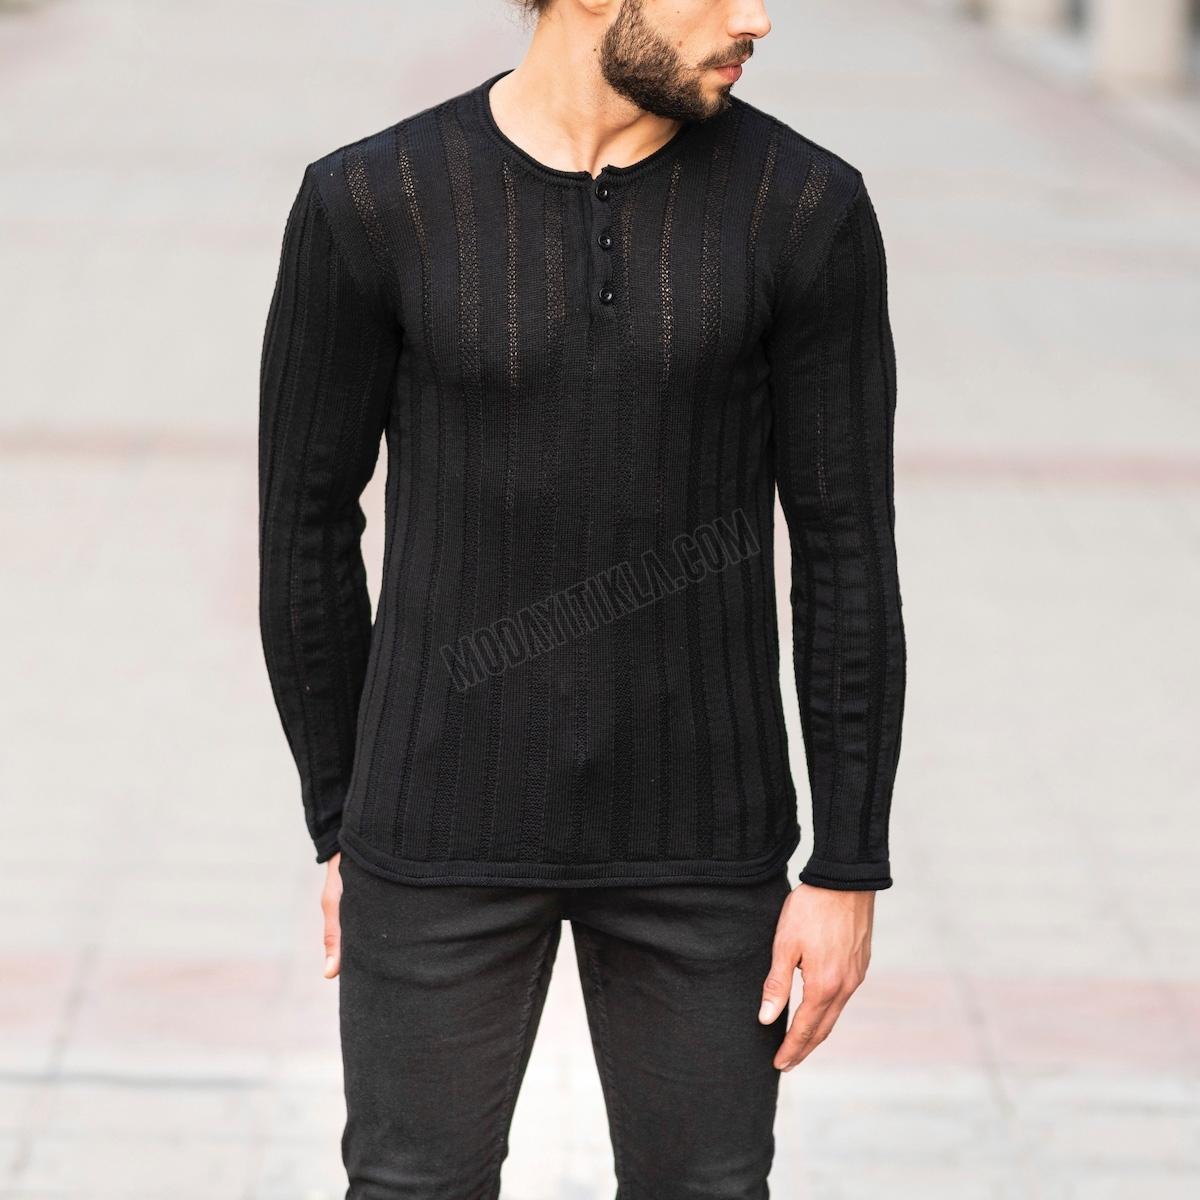 Erkek Transparan Detaylı Düğmeli Siyah Sweatshirt